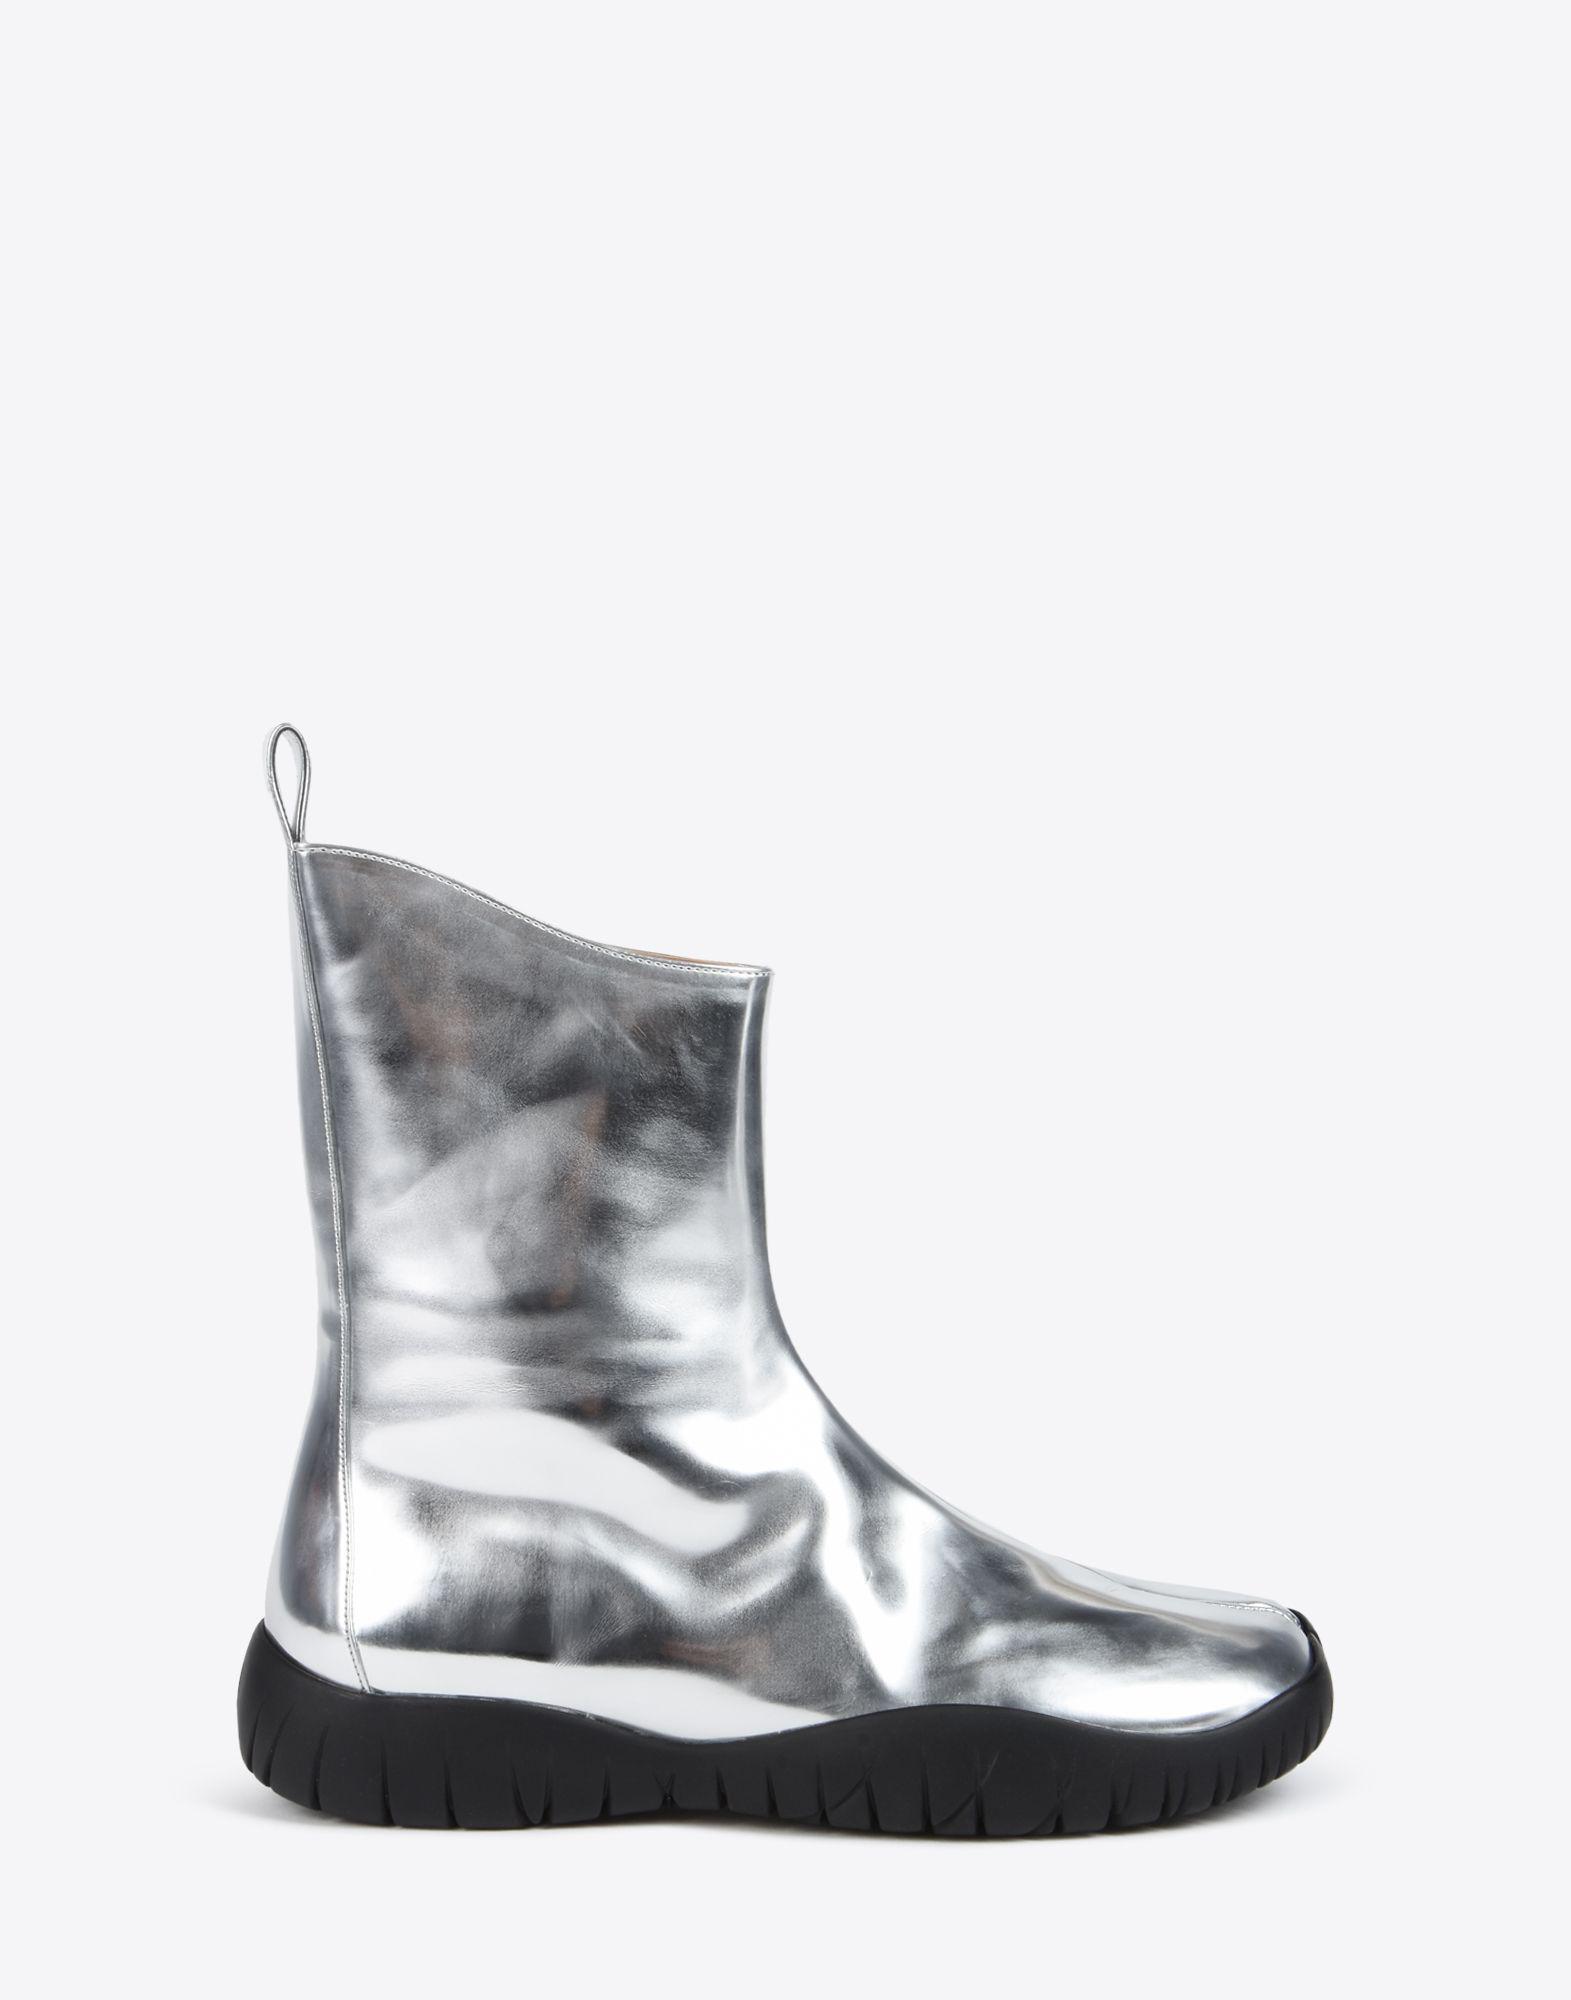 Silver Metallic Tabi Boots Maison Martin Margiela Buy Cheap Pictures j9WUx